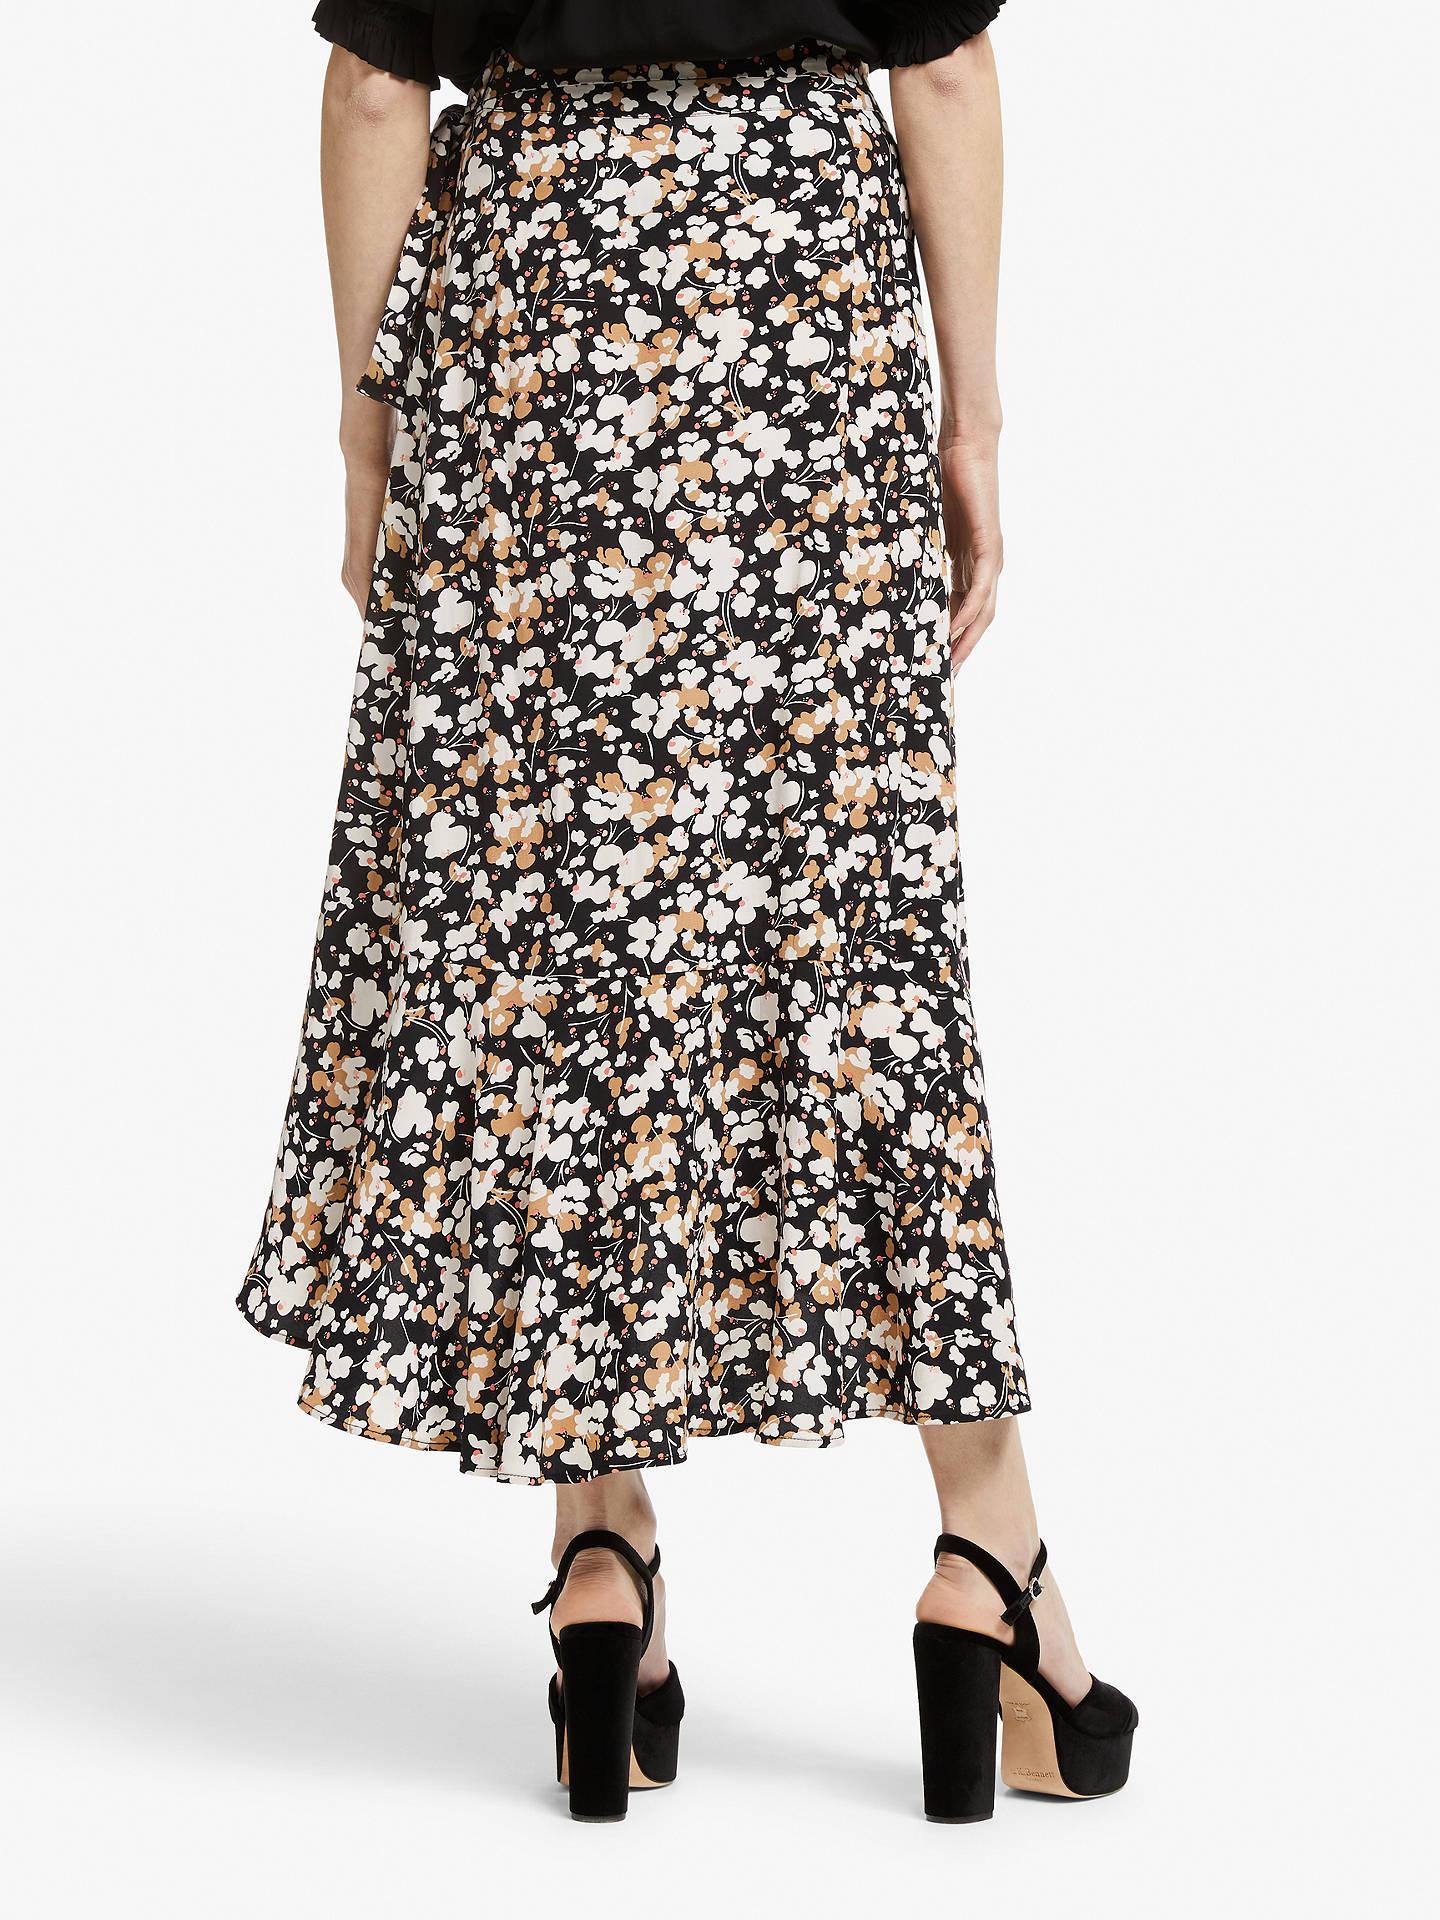 3bbf9056fbc4 ... Buy Somerset by Alice Temperley Dapple Apple Frill Wrap Skirt,  Black/Neutral, 10 ...